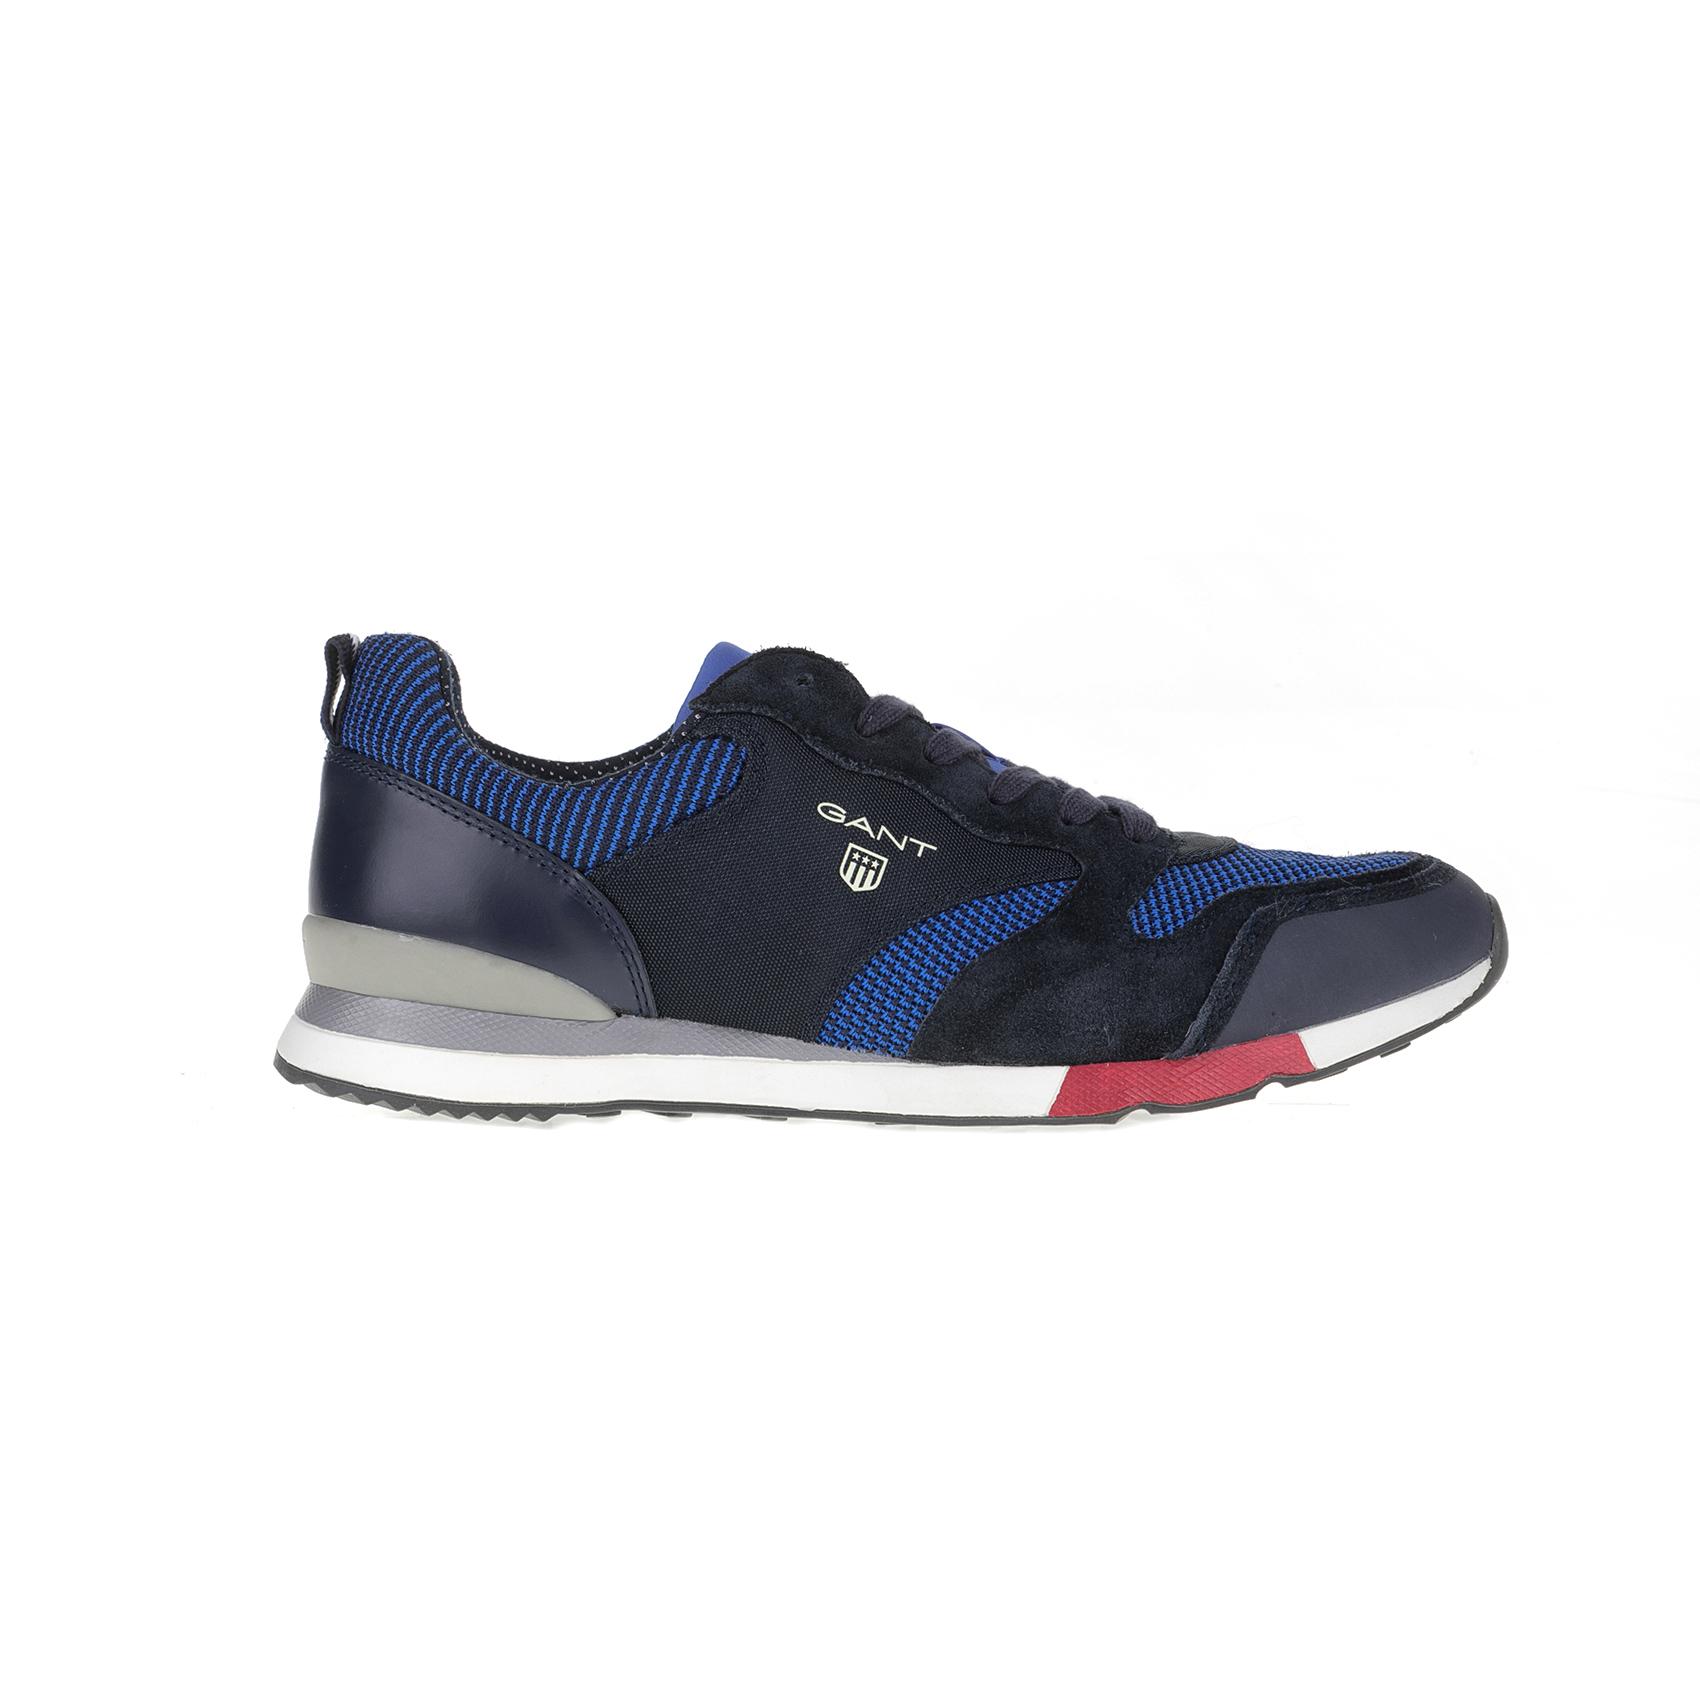 GANT – Ανδρικά παπούτσια GANT Russell μπλε